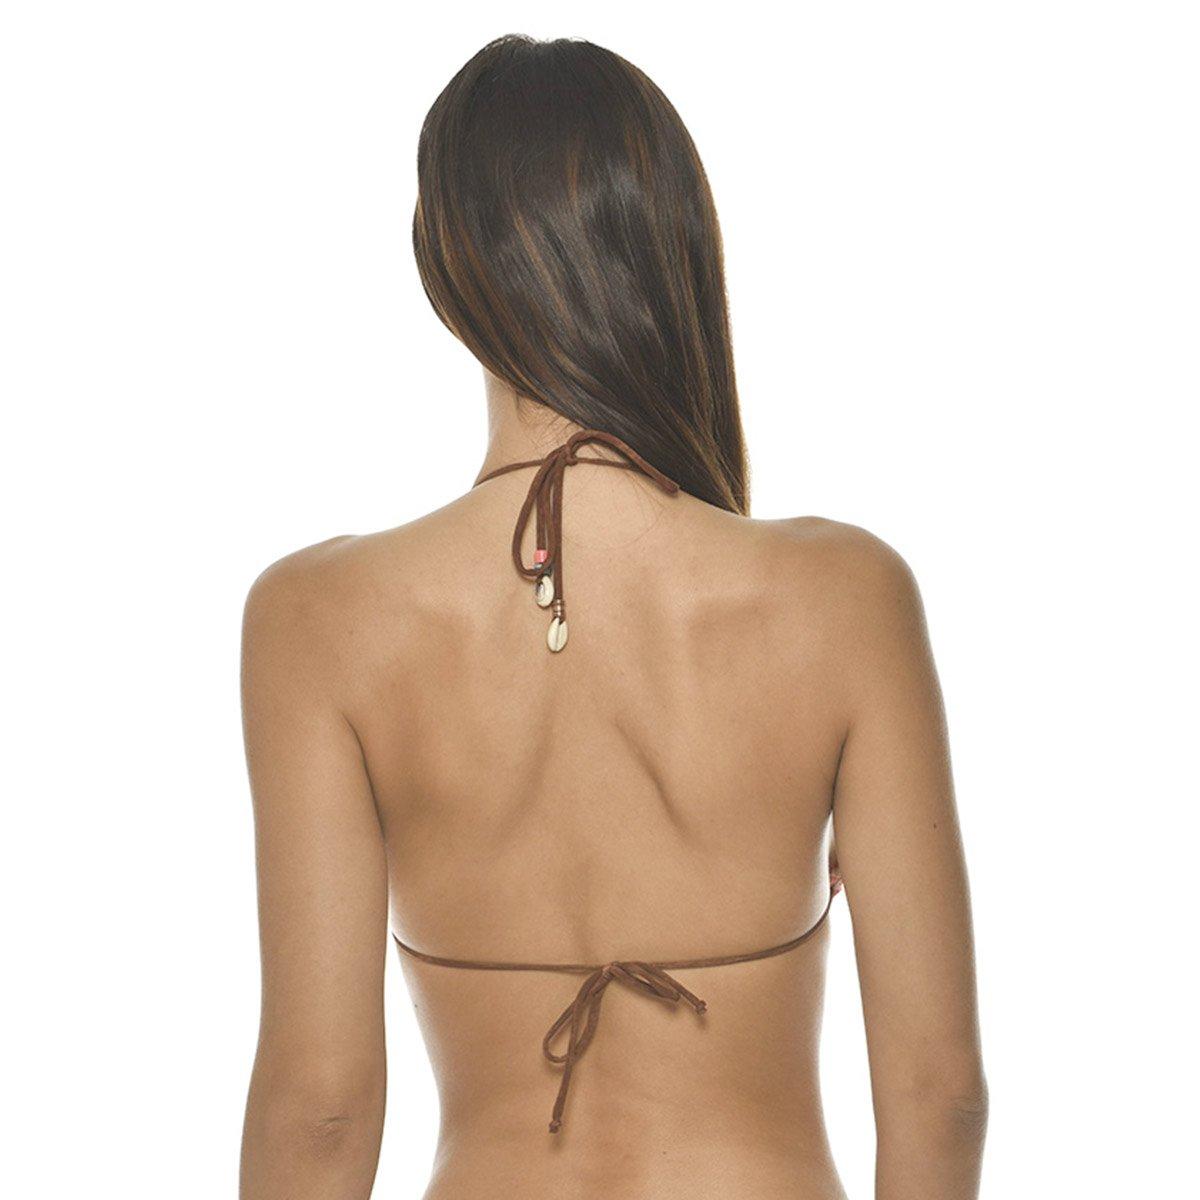 6d106ffd32 BANANA MOON FEBO BOHOSUN, Haut de Bikini Triangle, Orange: Amazon.fr:  Vêtements et accessoires